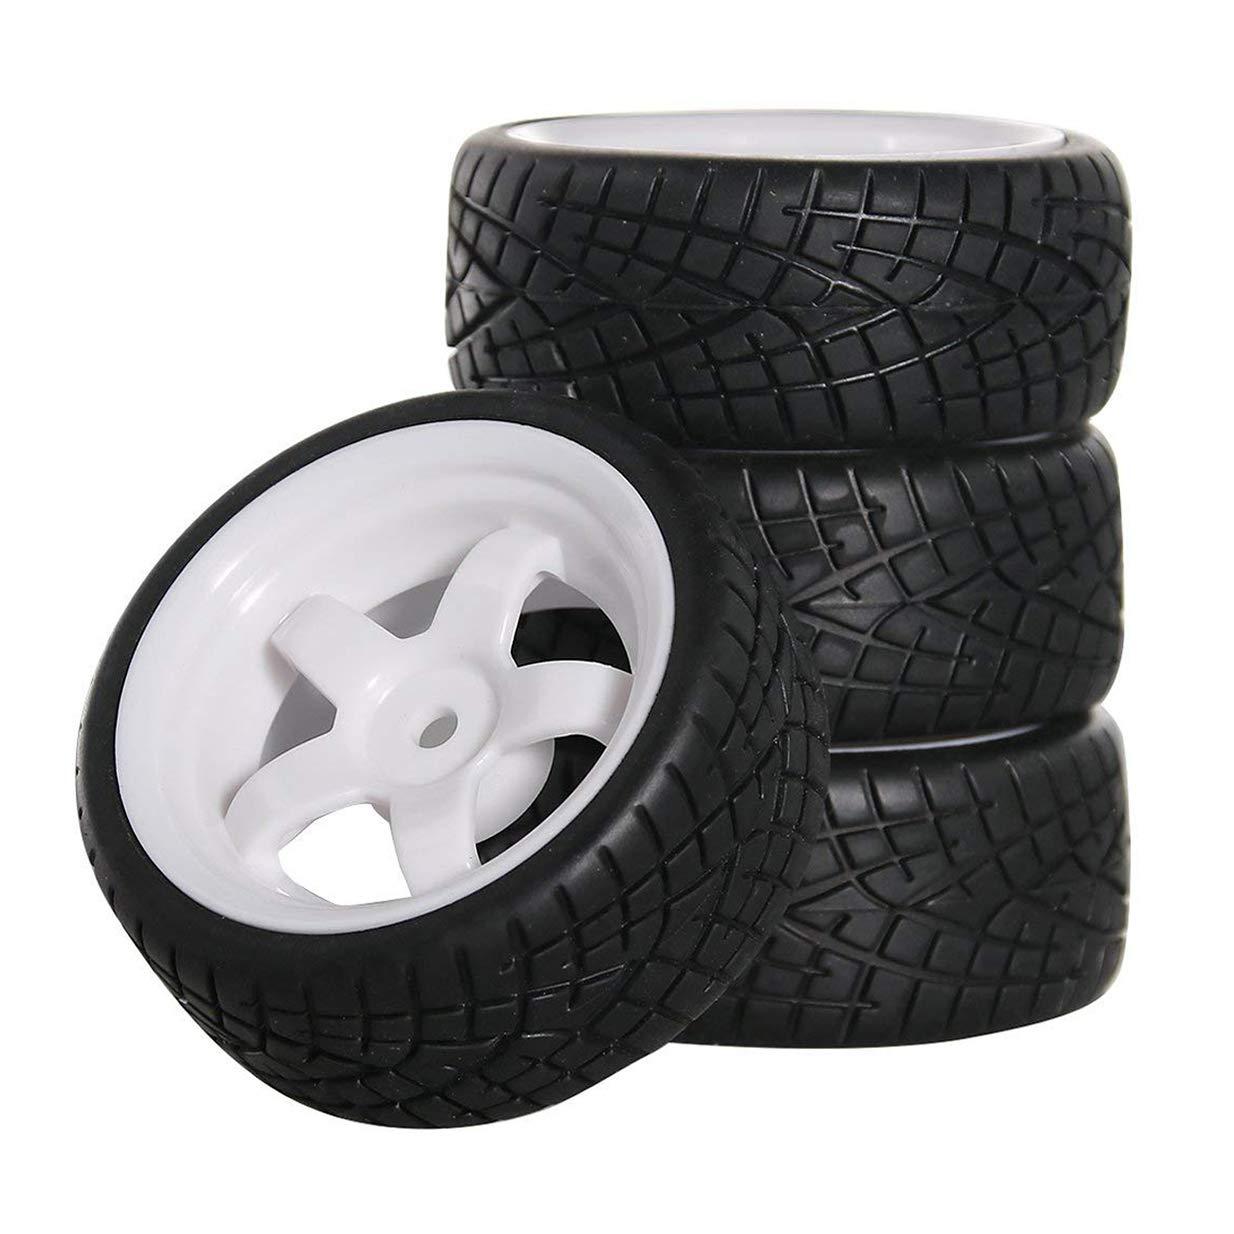 ShareGoo 12mm Hex White 5 Spoke Plastic Wheel Rims and Rubbe